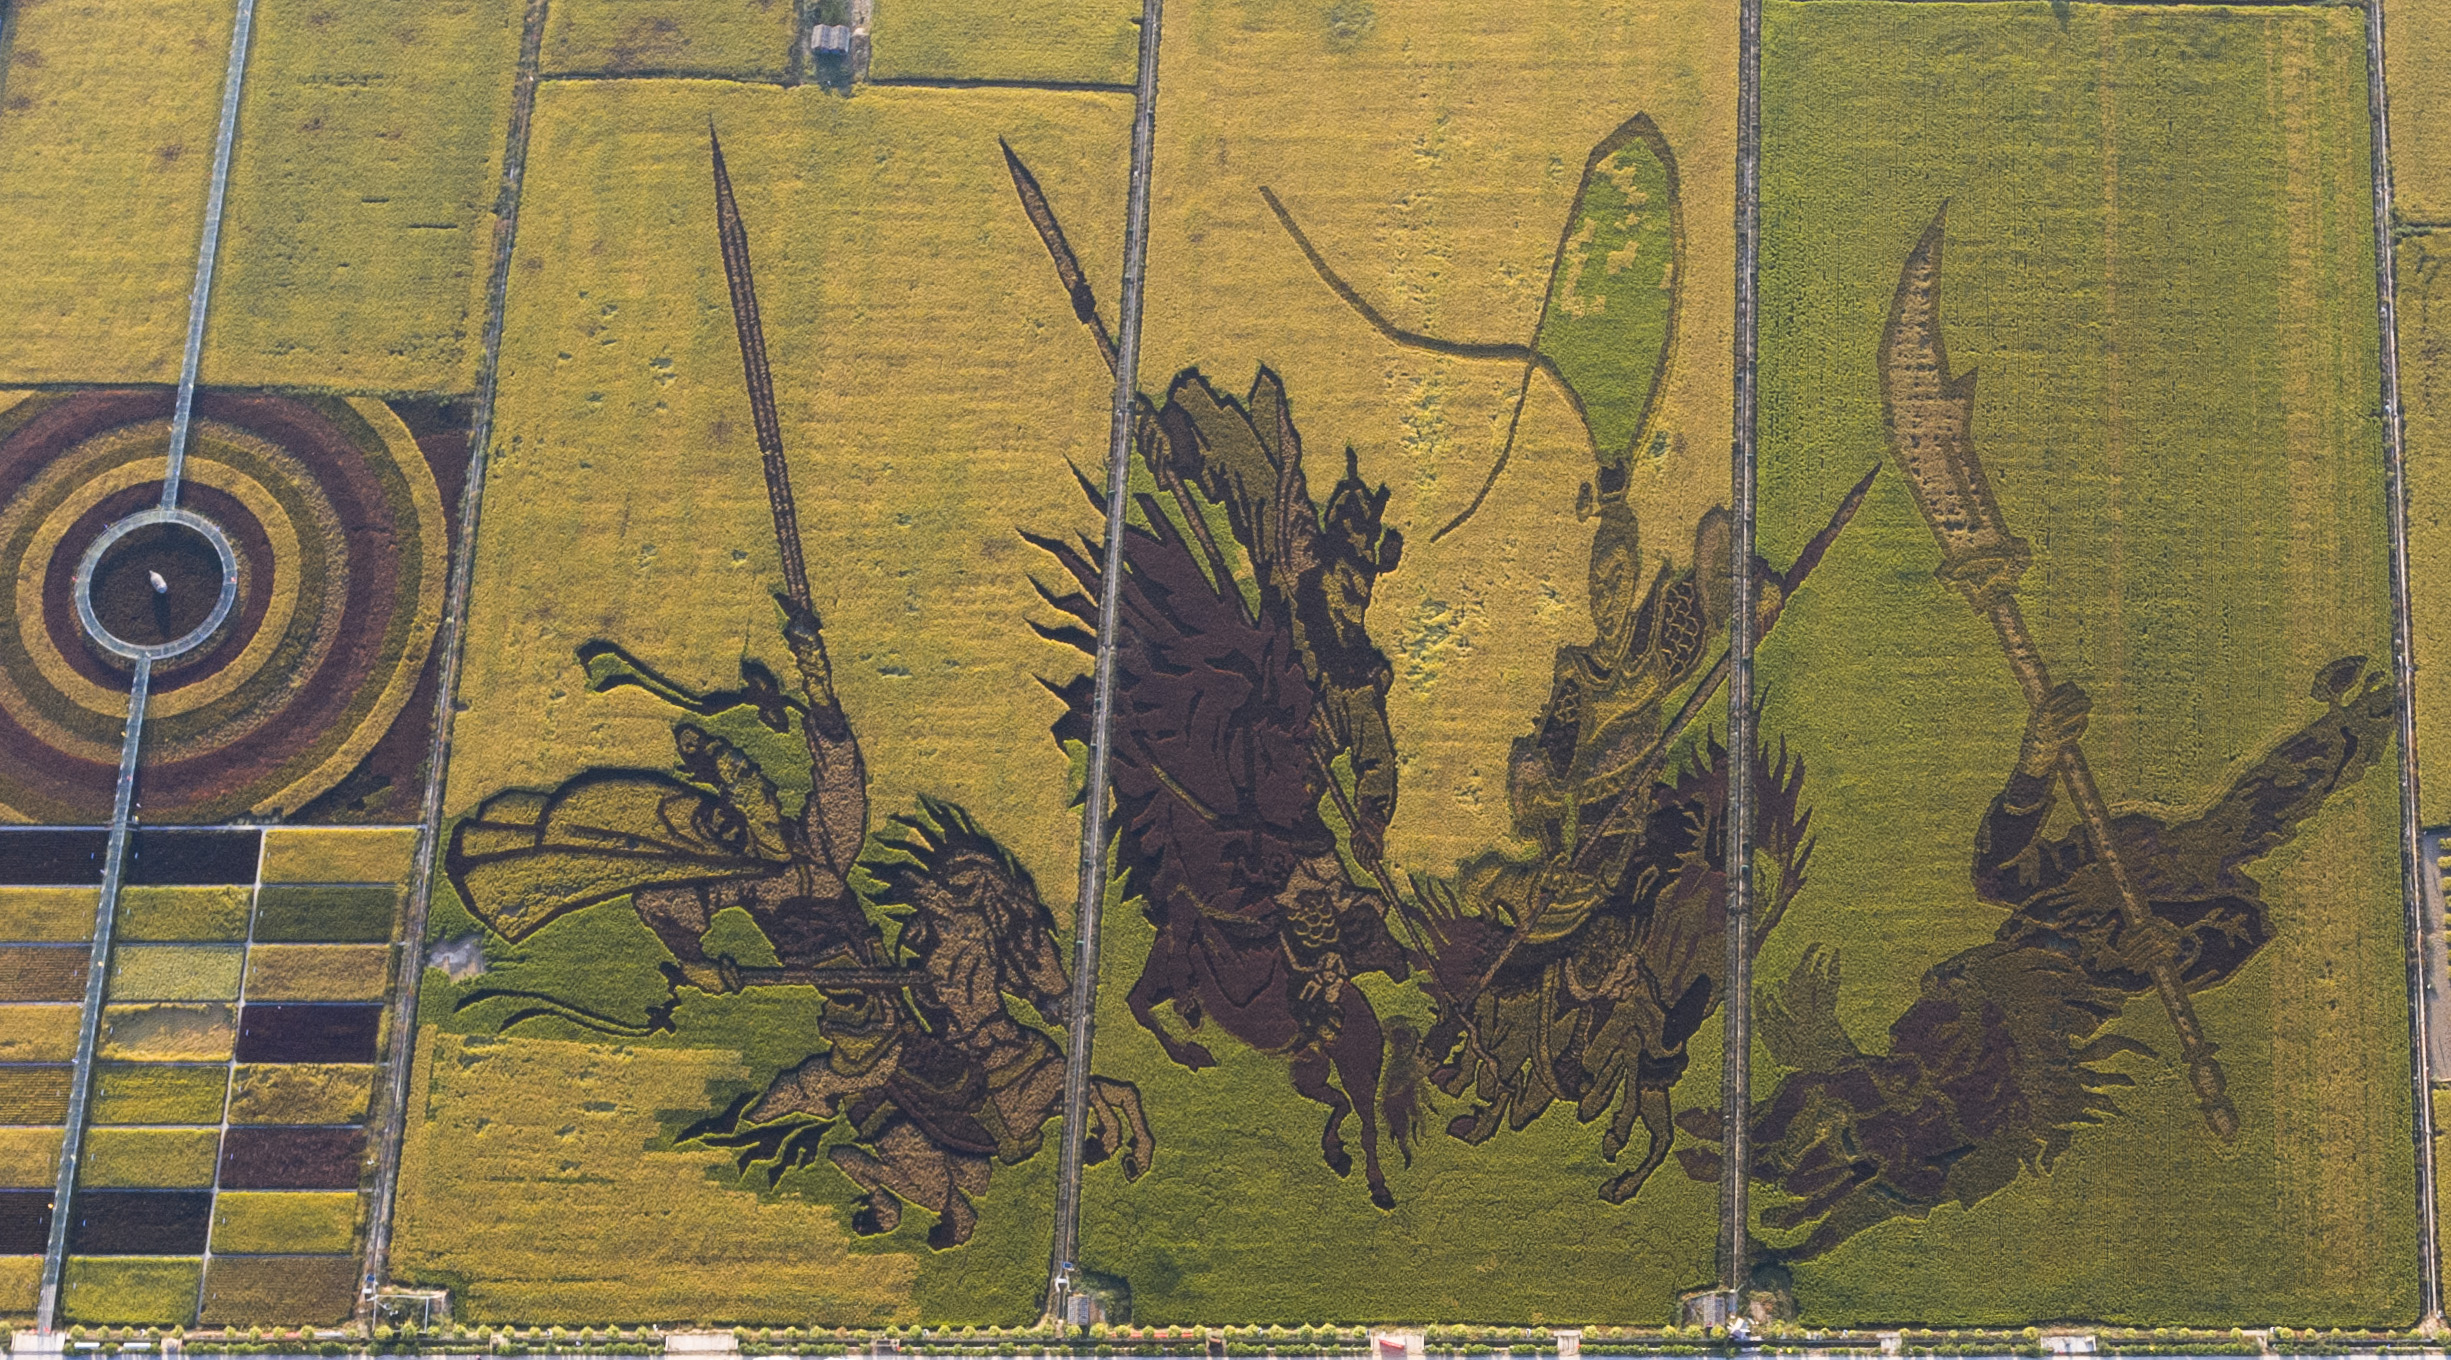 Rice Paddy Art in Ningxia - Xinhua | English.news.cn